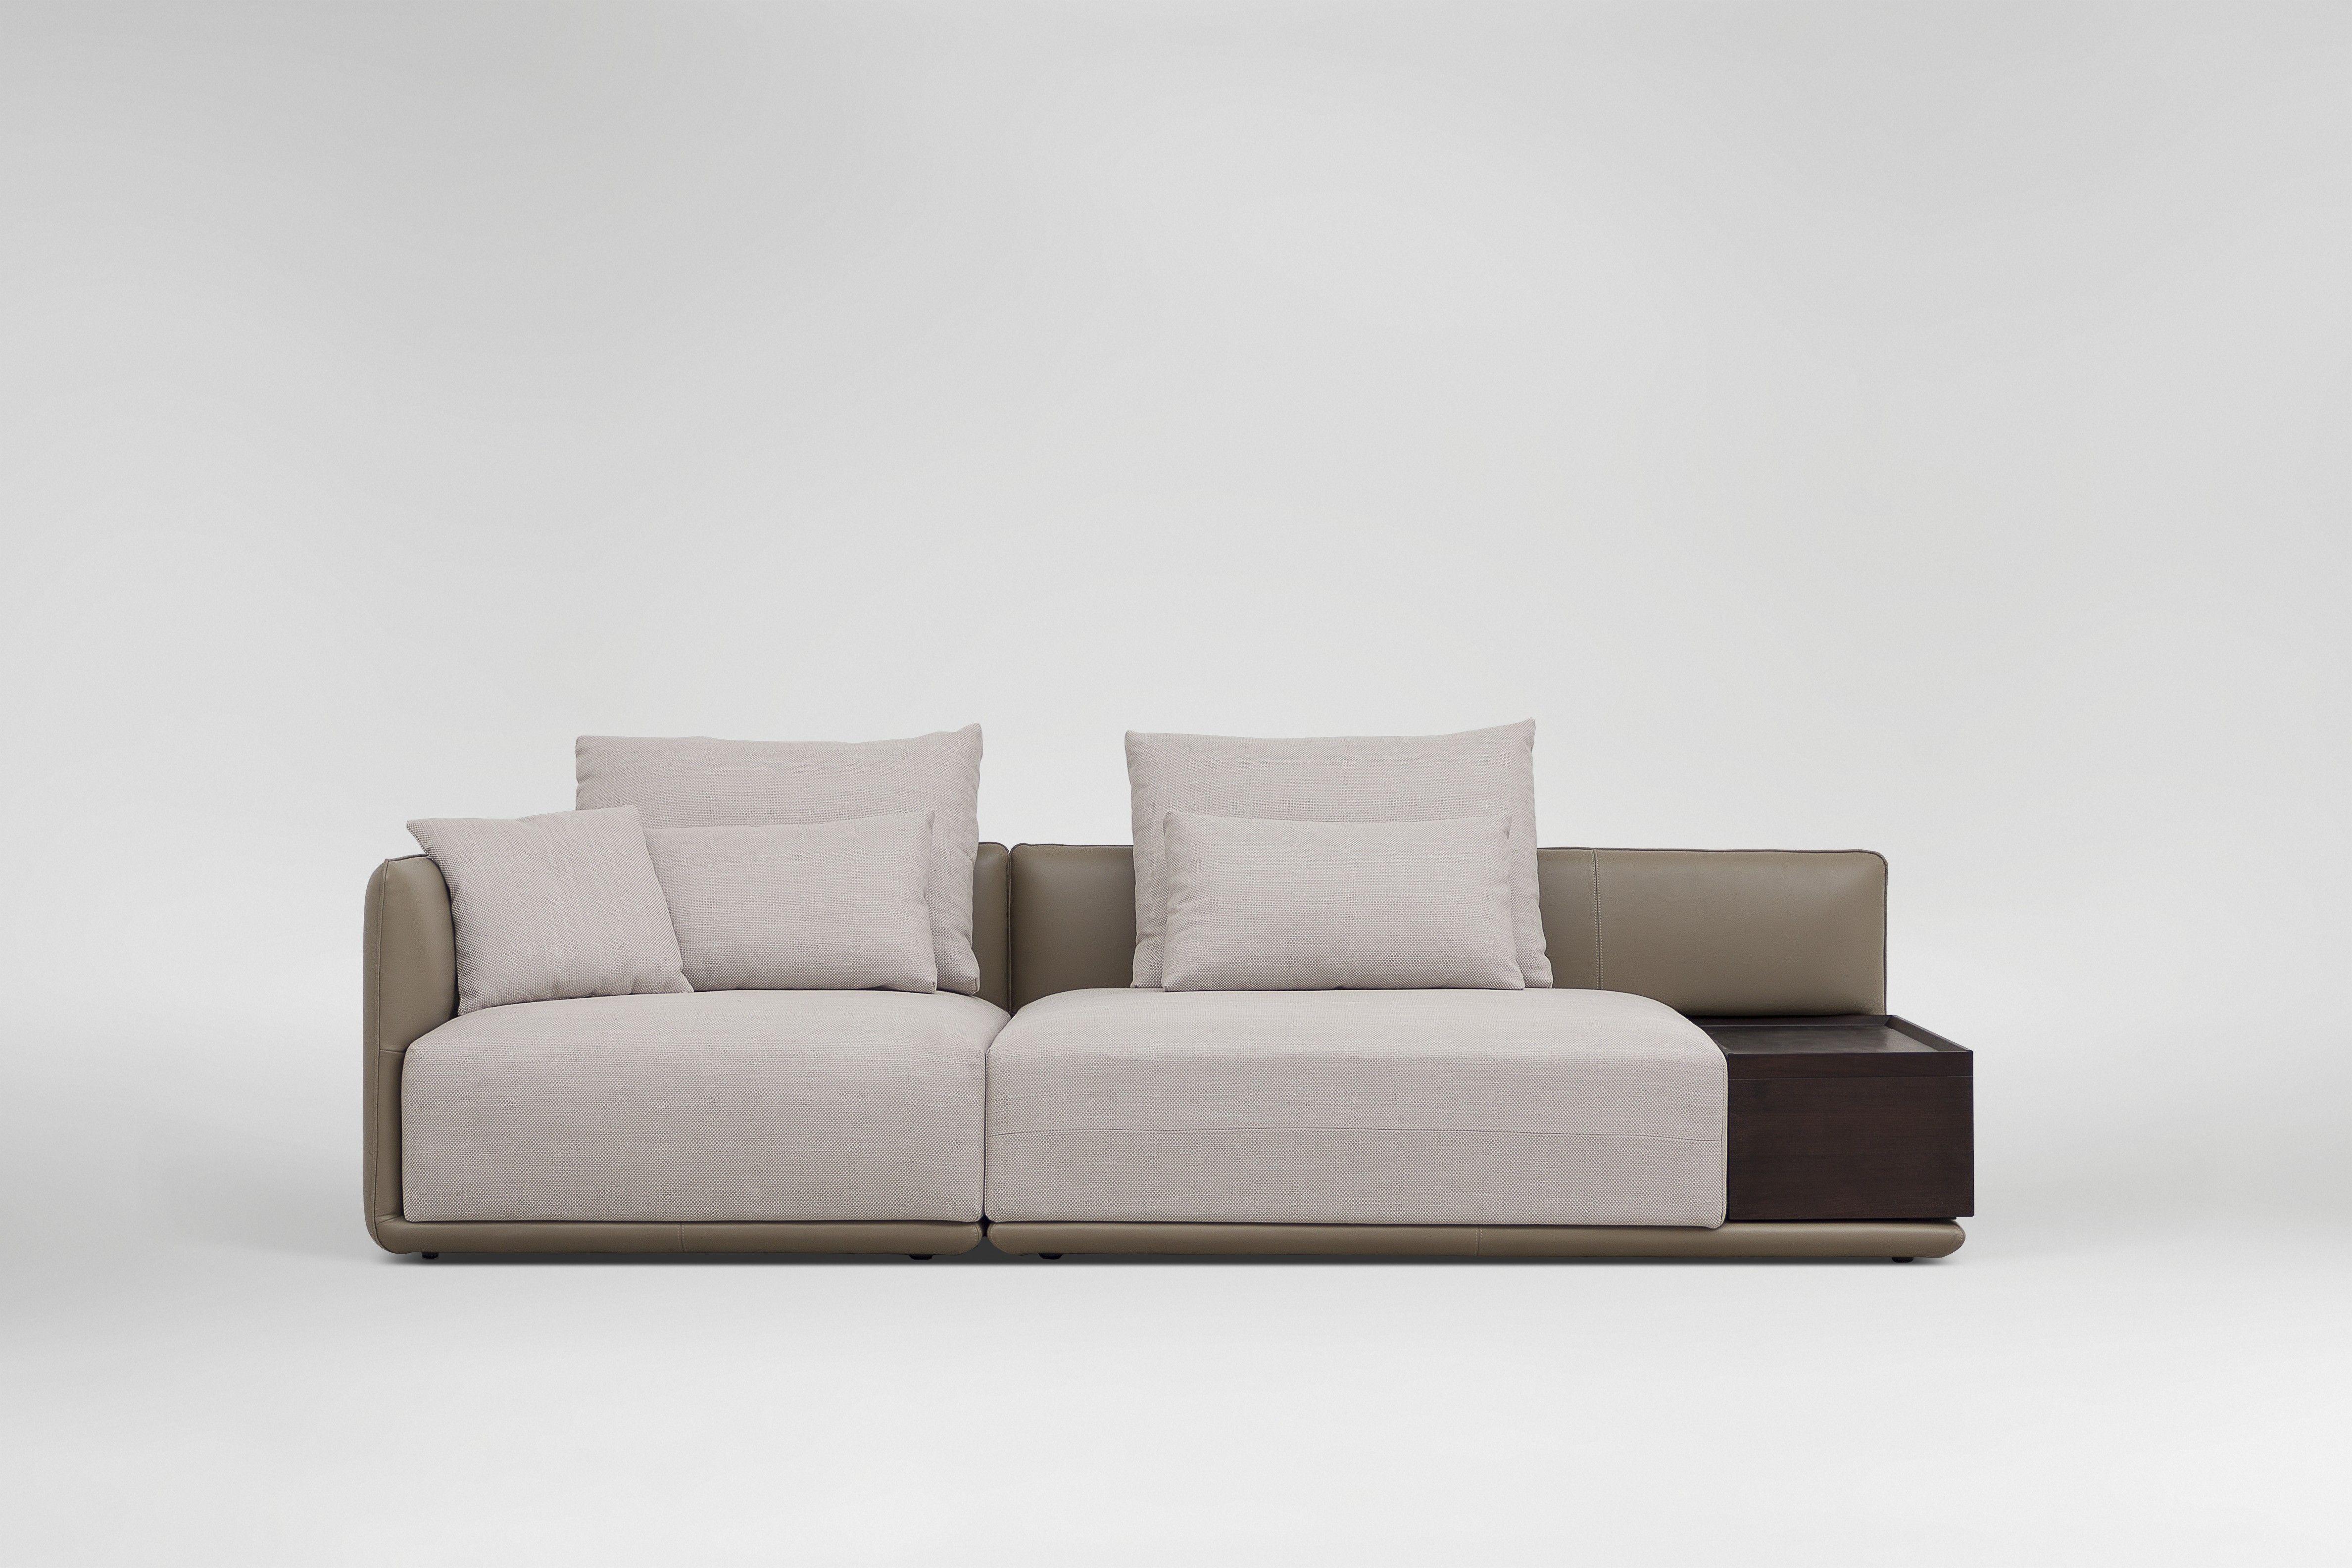 Camerich Elan Sofa Sofa Sofa Layout Modern Furniture Living Room